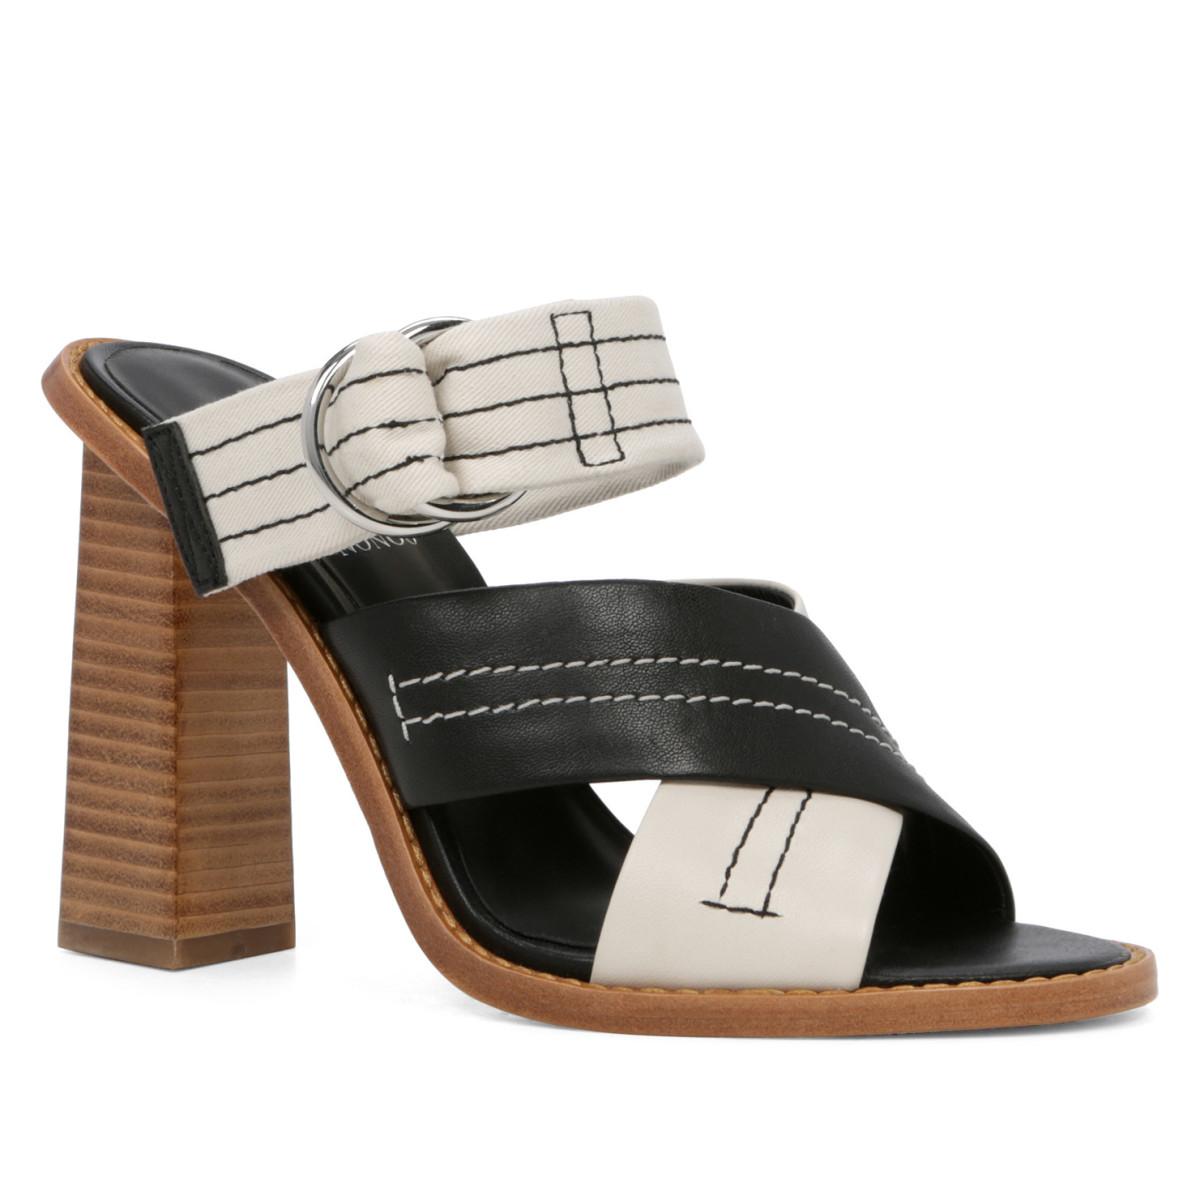 Aldo gift card giveaway_Misha Nonoo ELORA stacked heel slide